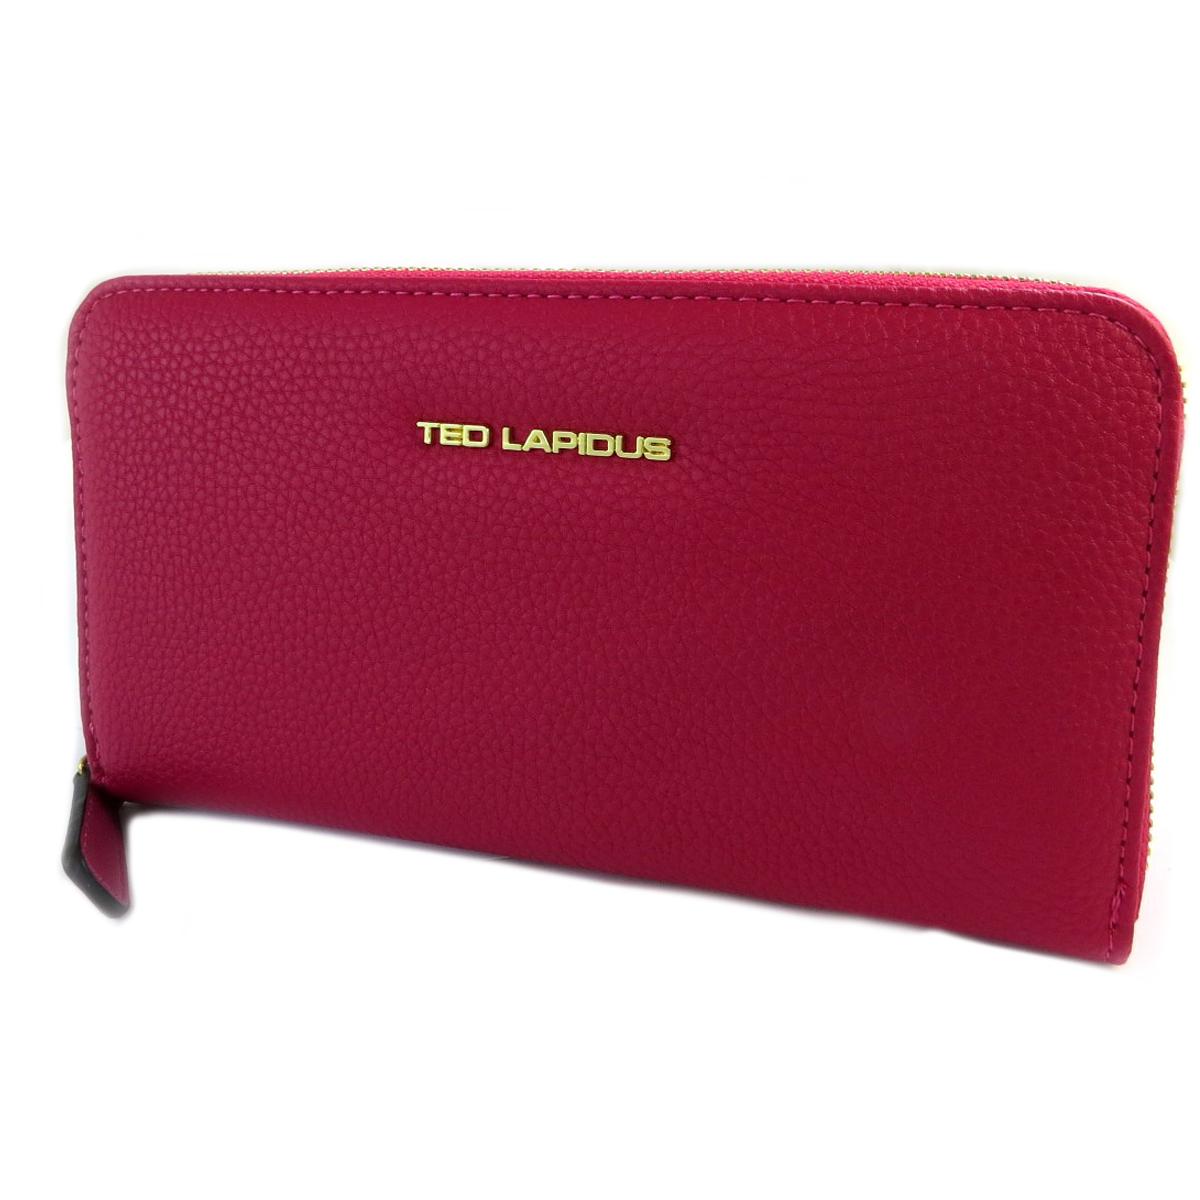 Compagnon zippé \'Ted Lapidus\' rose fuschia - 20x11x2 cm - [Q2243]